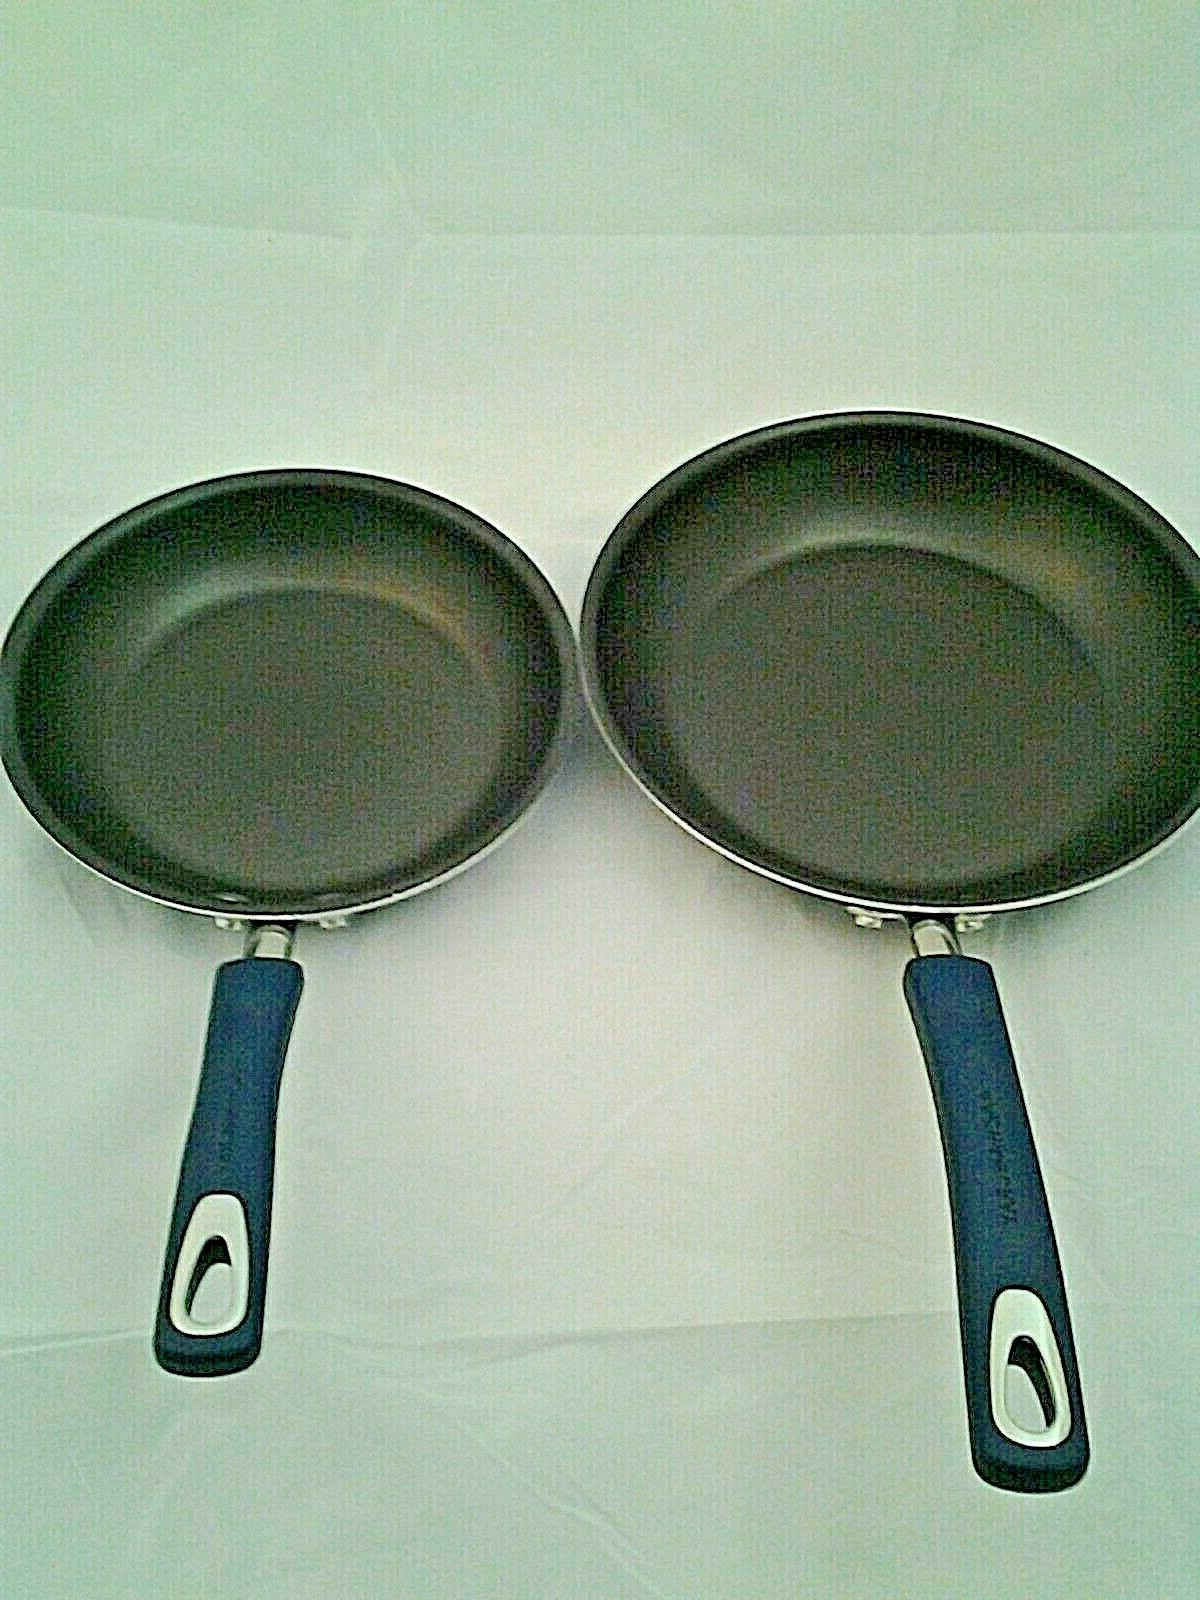 Rachael Ray Porcelain Aluminum 2 Fry Pan inch,